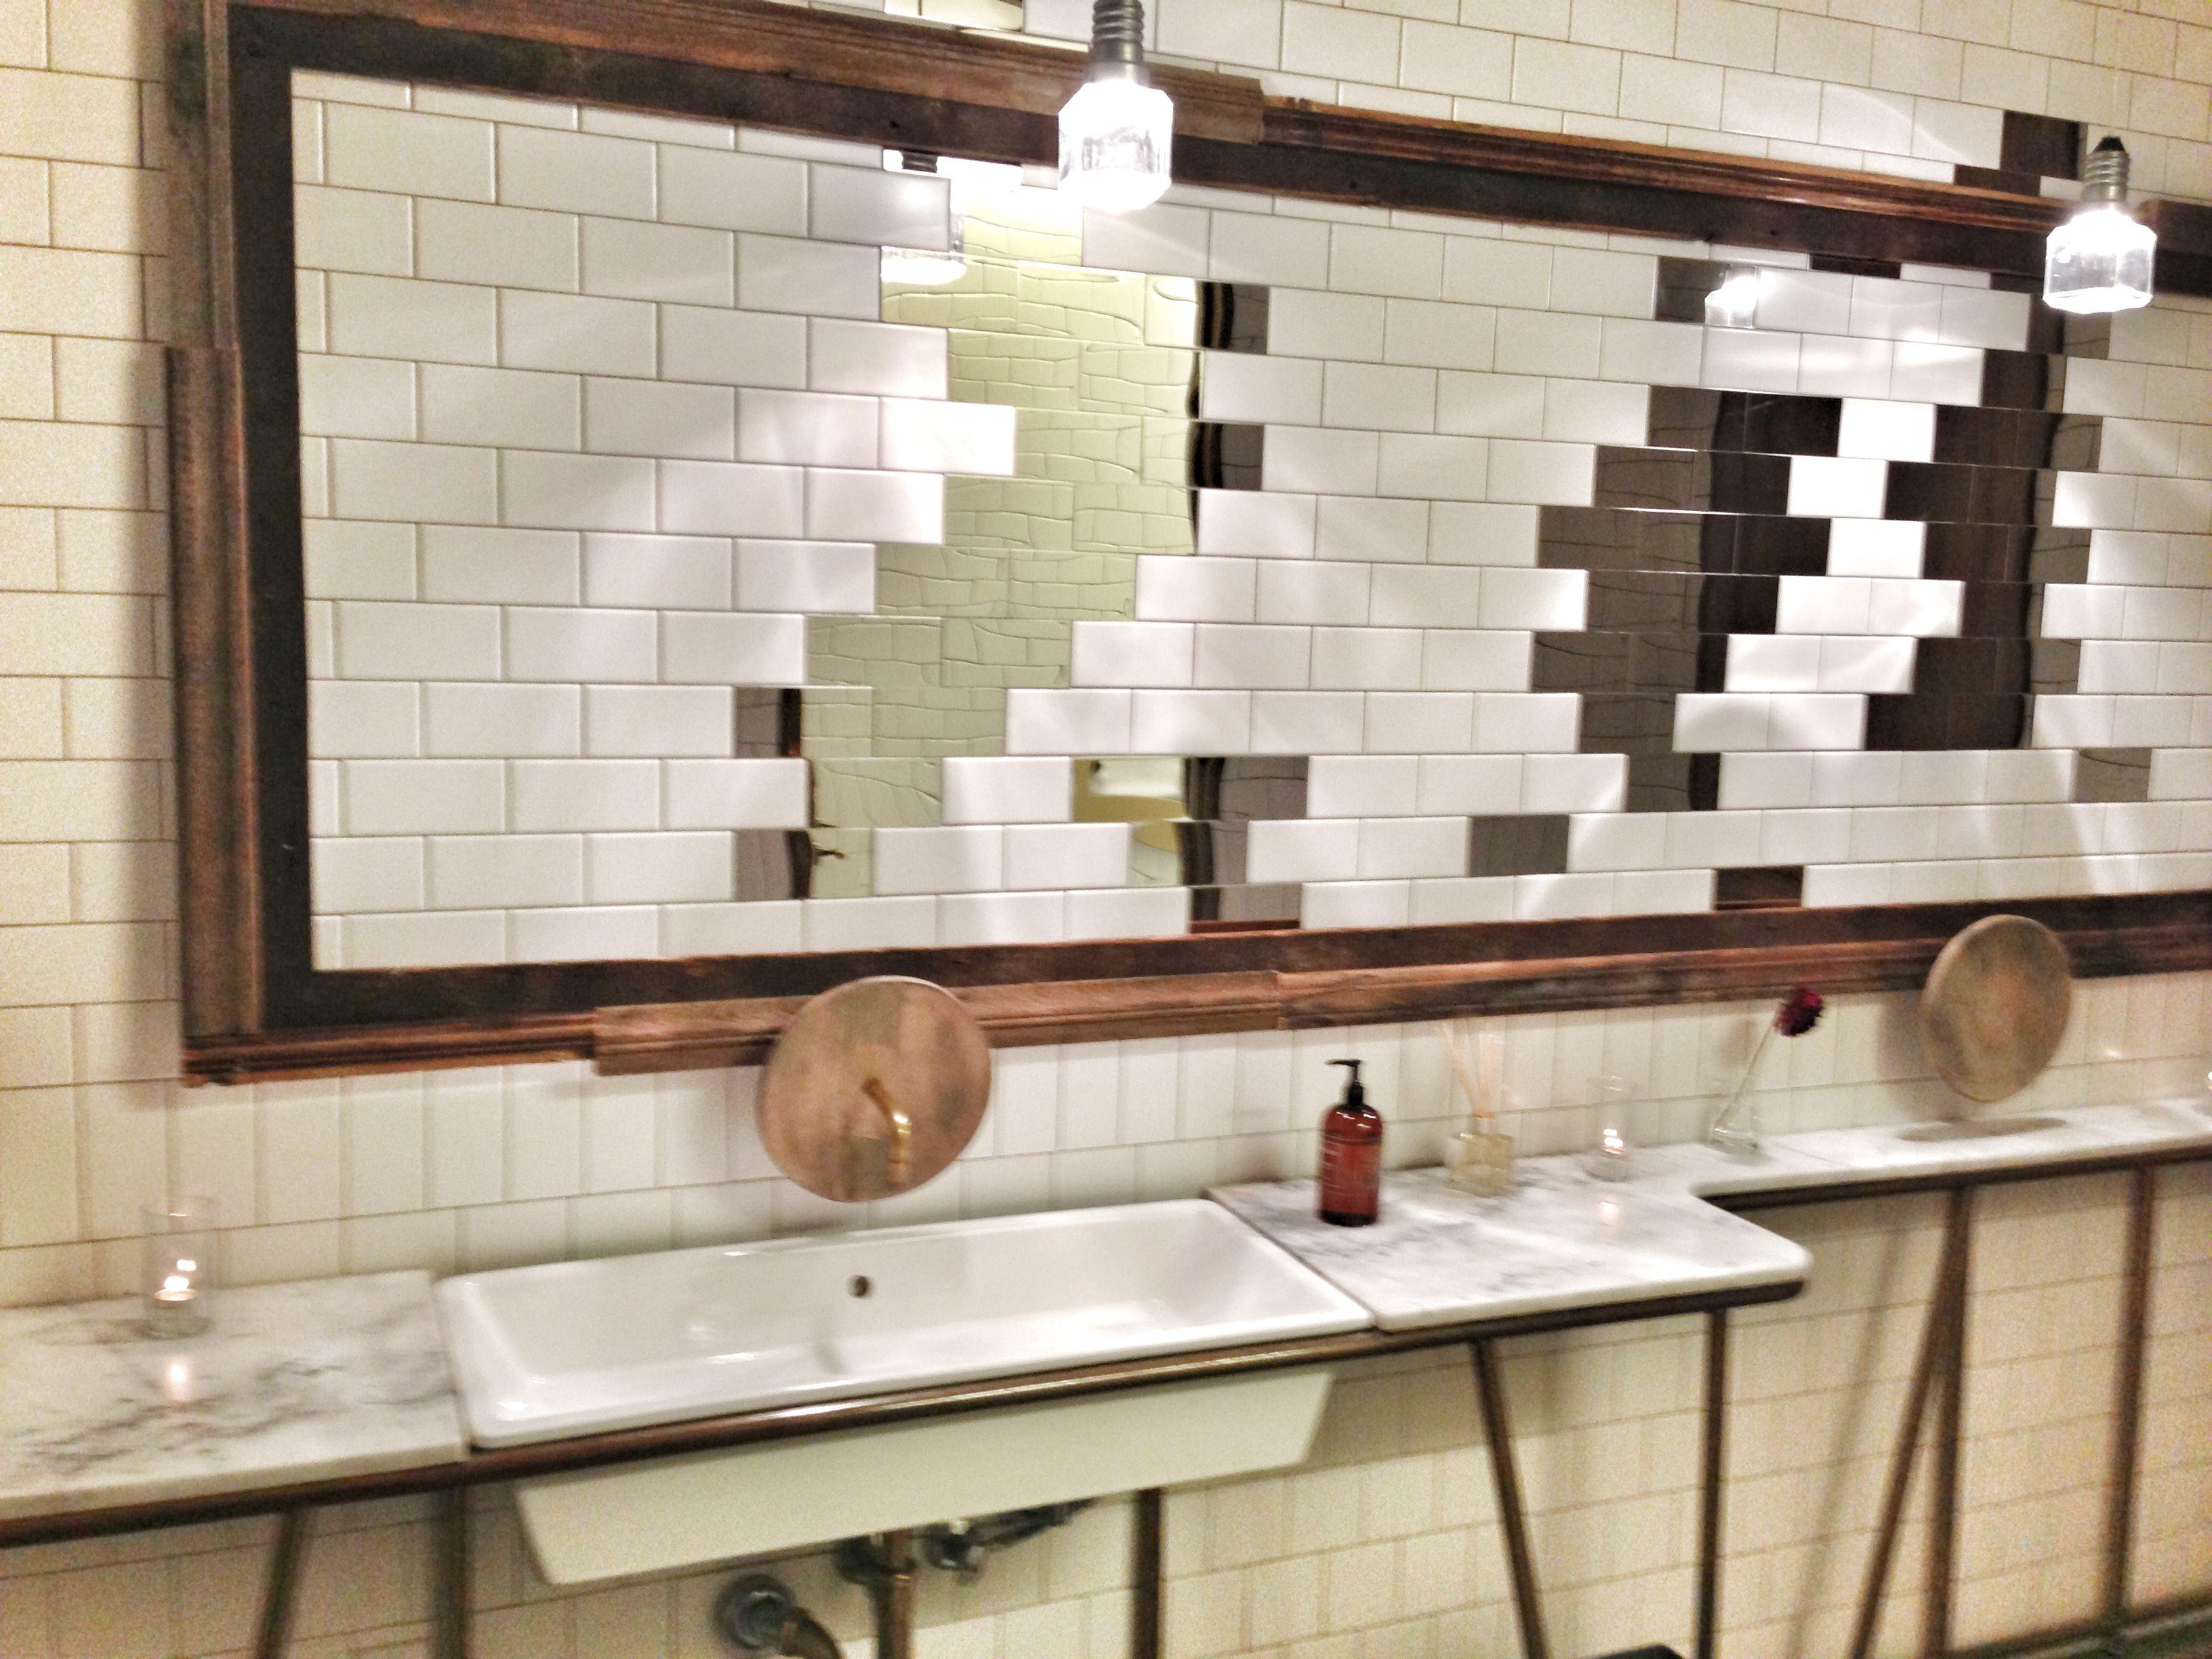 Fantastic creative design using tiles as mirror  Taken in Hinoki   The Bird  Restroom. Fantastic creative design using tiles as mirror  Taken in Hinoki